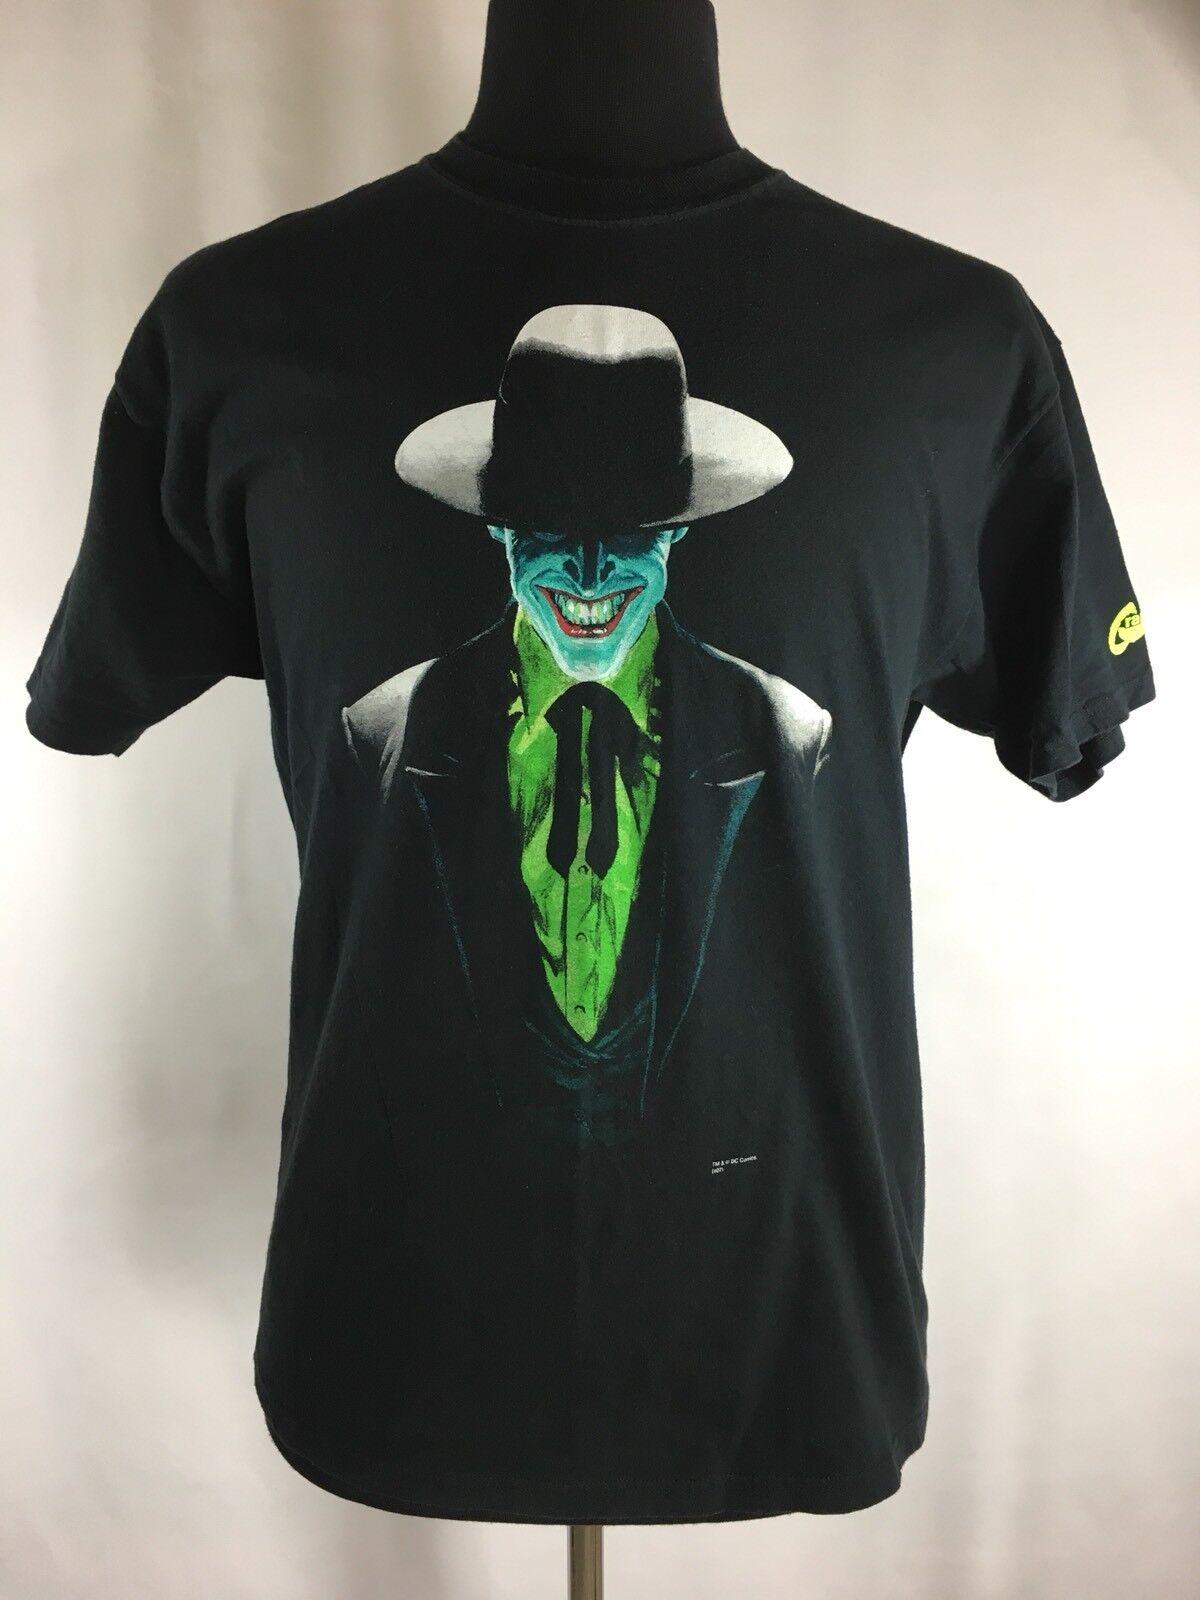 Vintage Joker Men's Large Shirt Batman DC Comics